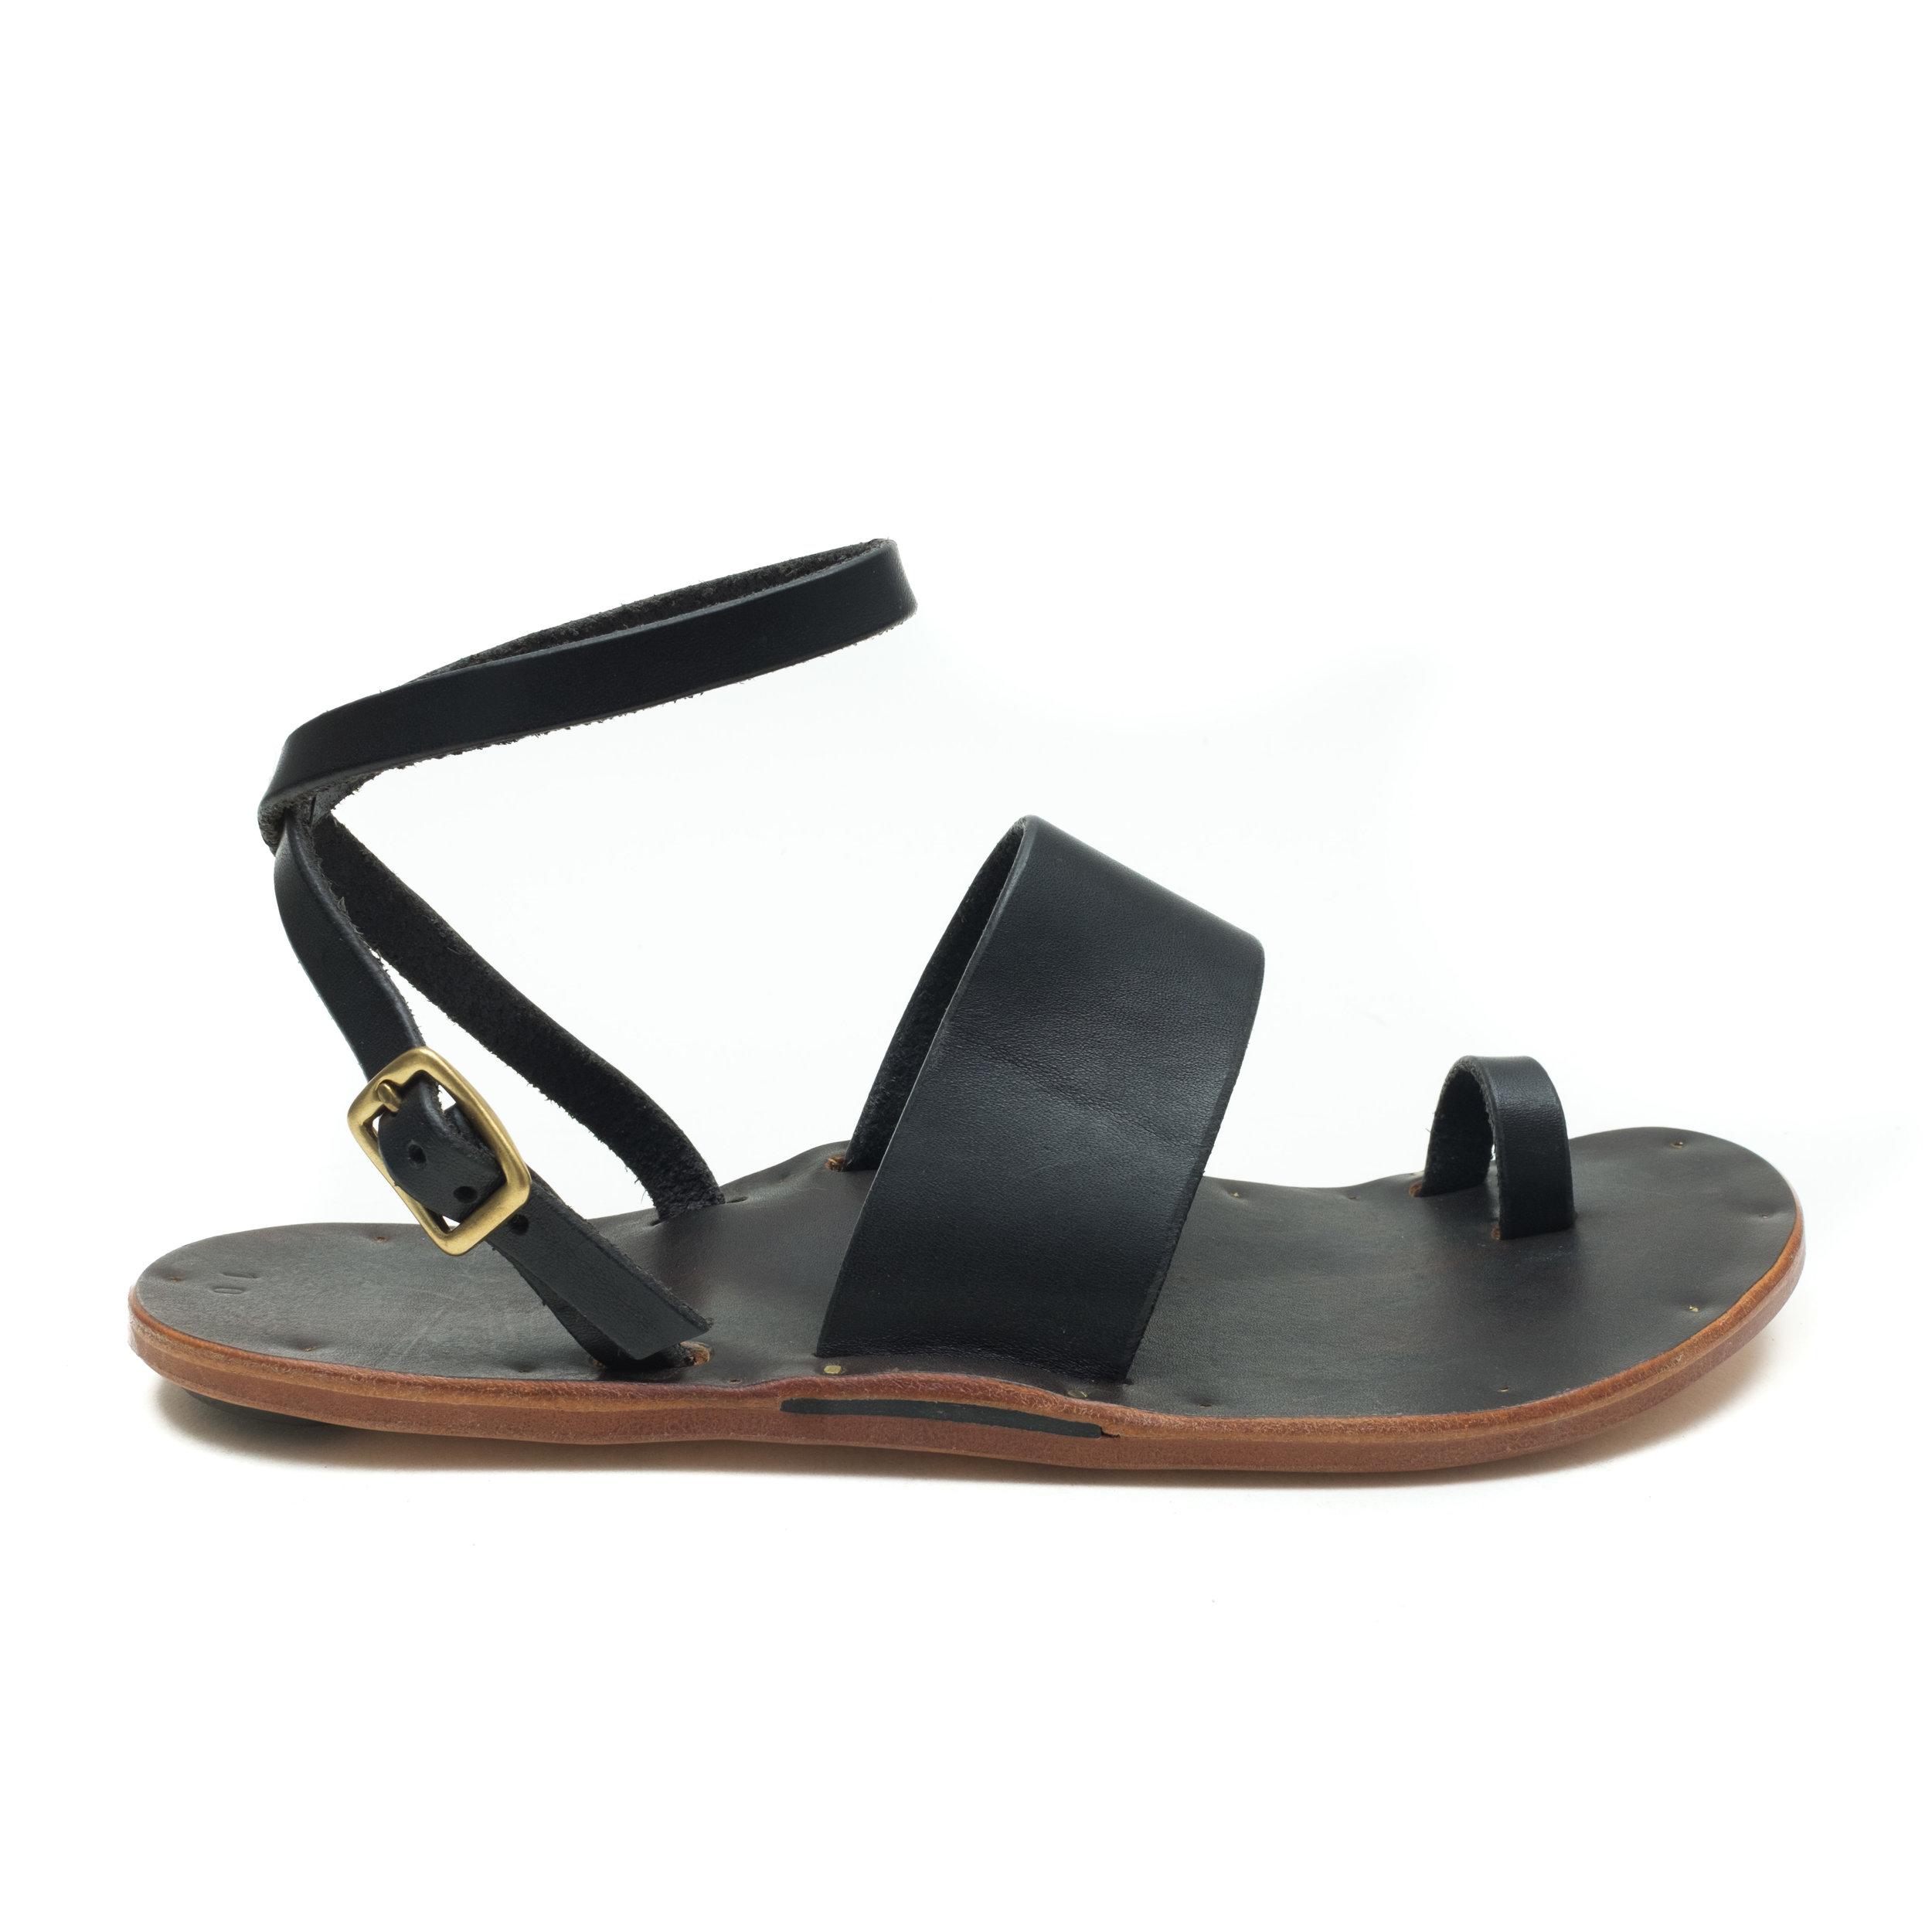 Toe Loop w/ Ankle Strap - Sandals - KikaNY